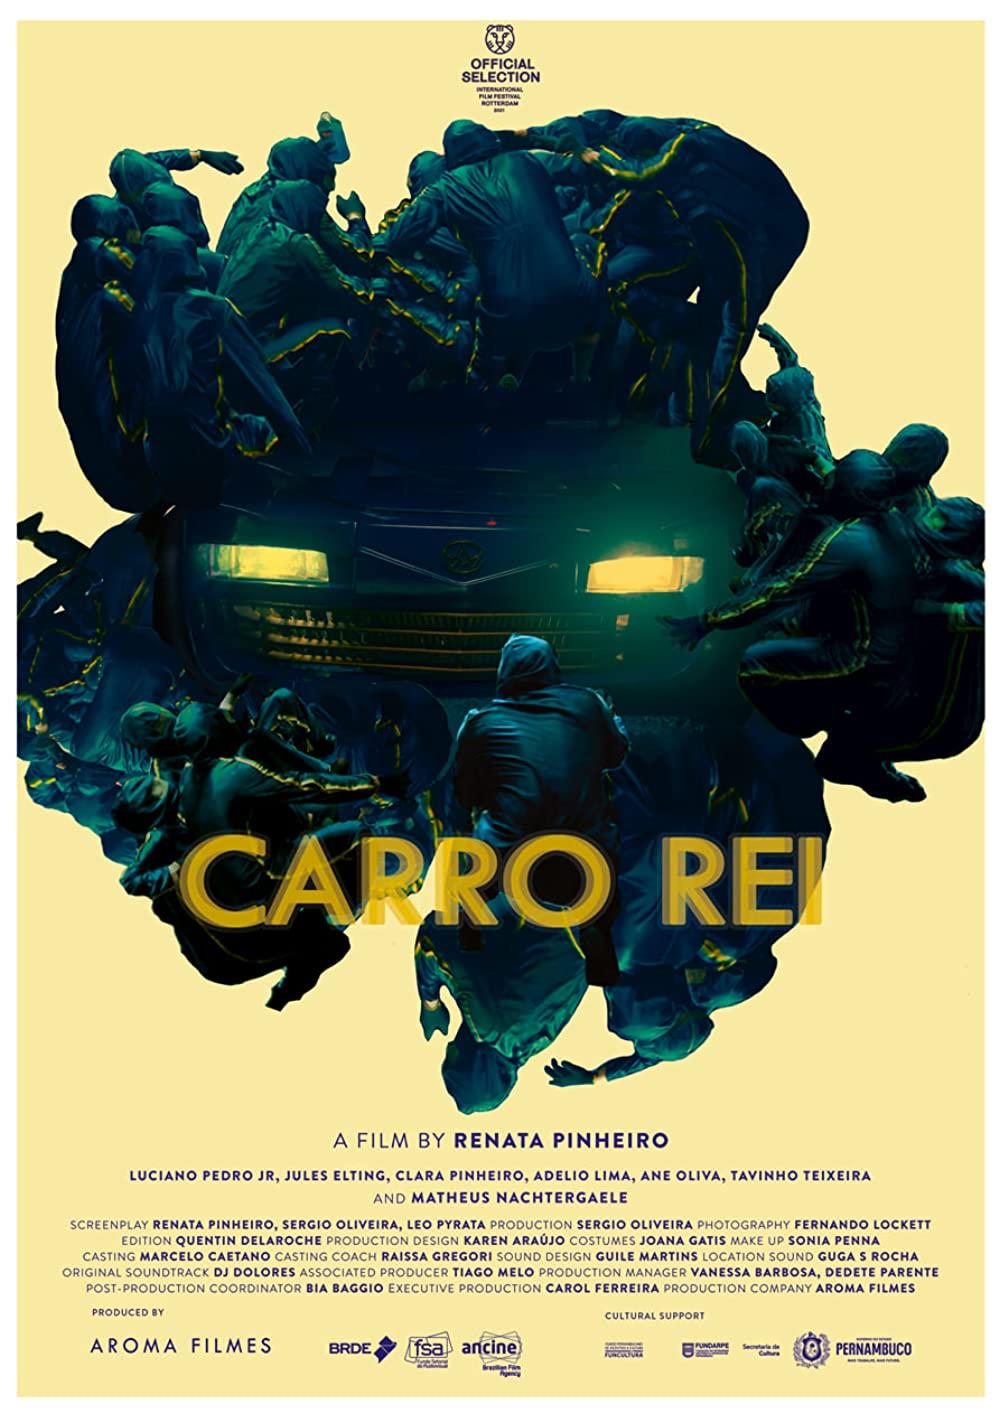 King Car Film Review